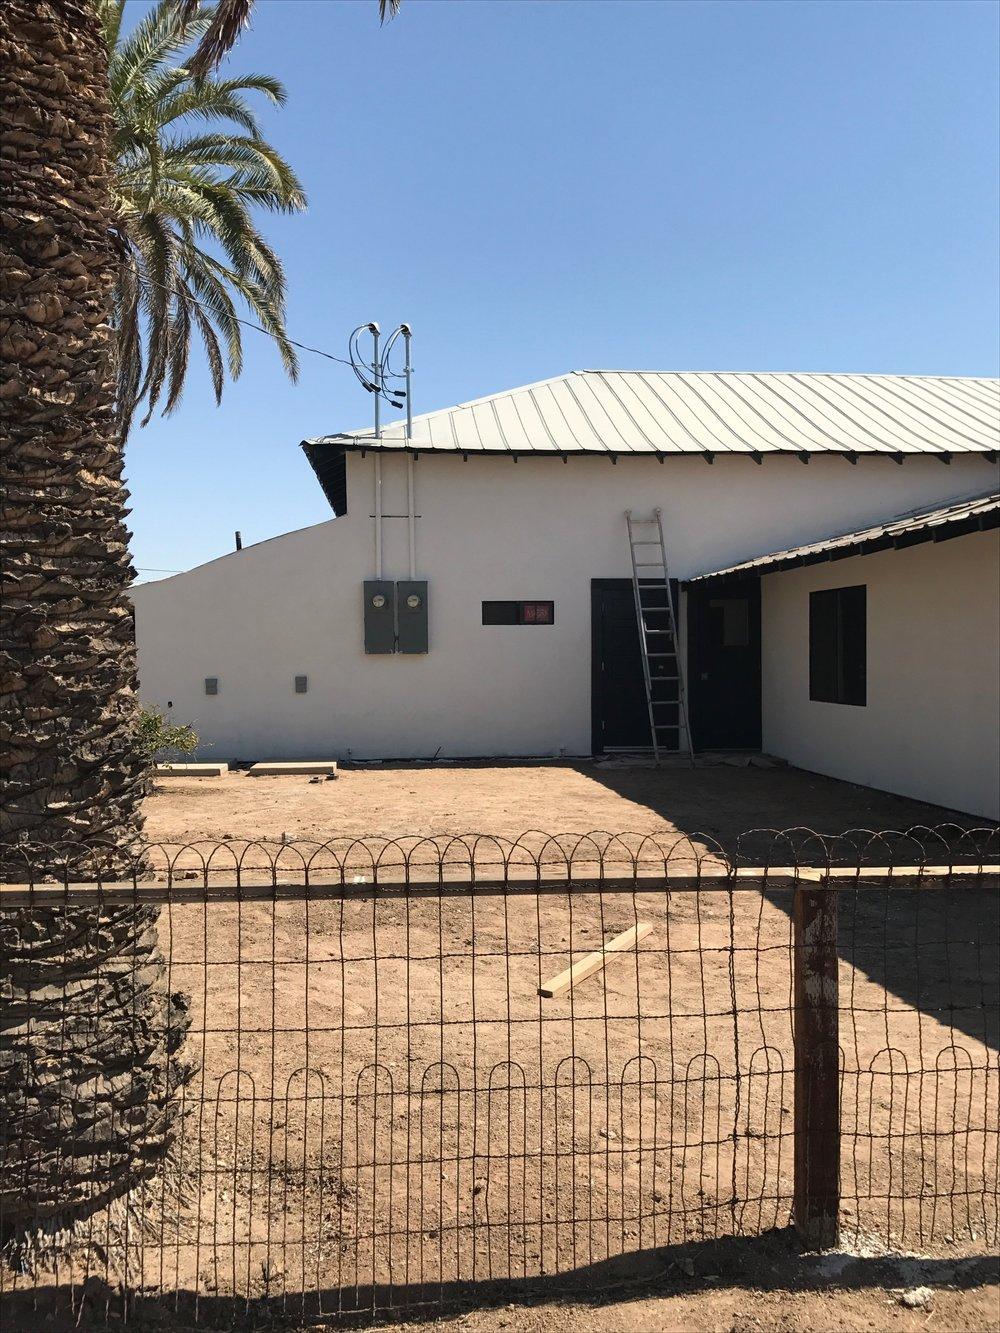 Rowhouse25 - Tremaine Ranch - Air BNB Rental - Phoenix, Arizona1.JPG